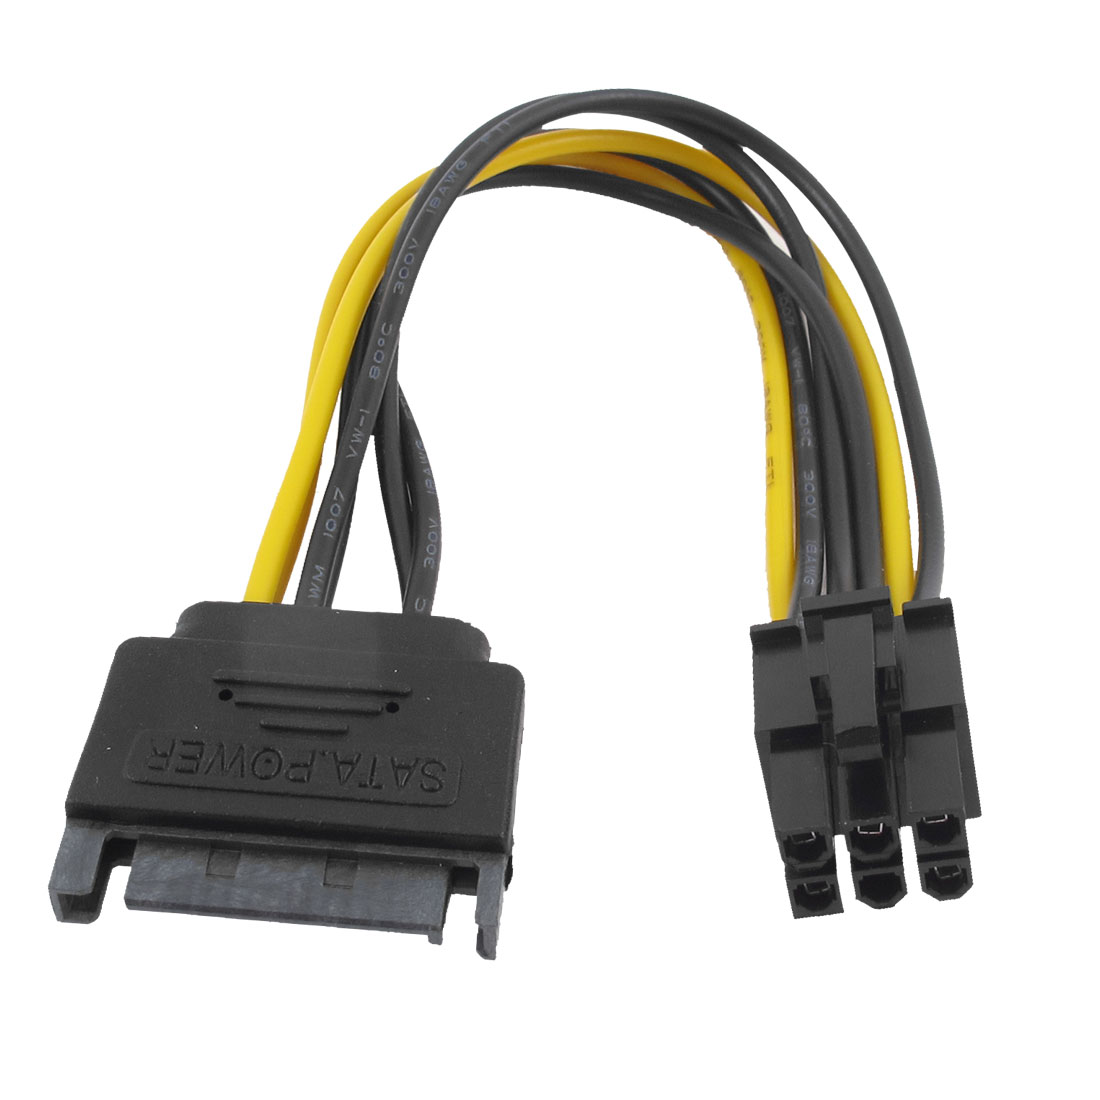 SATA 15 Pin Male to PCI-E 6 Pin Female M/F Video Card Power Cable